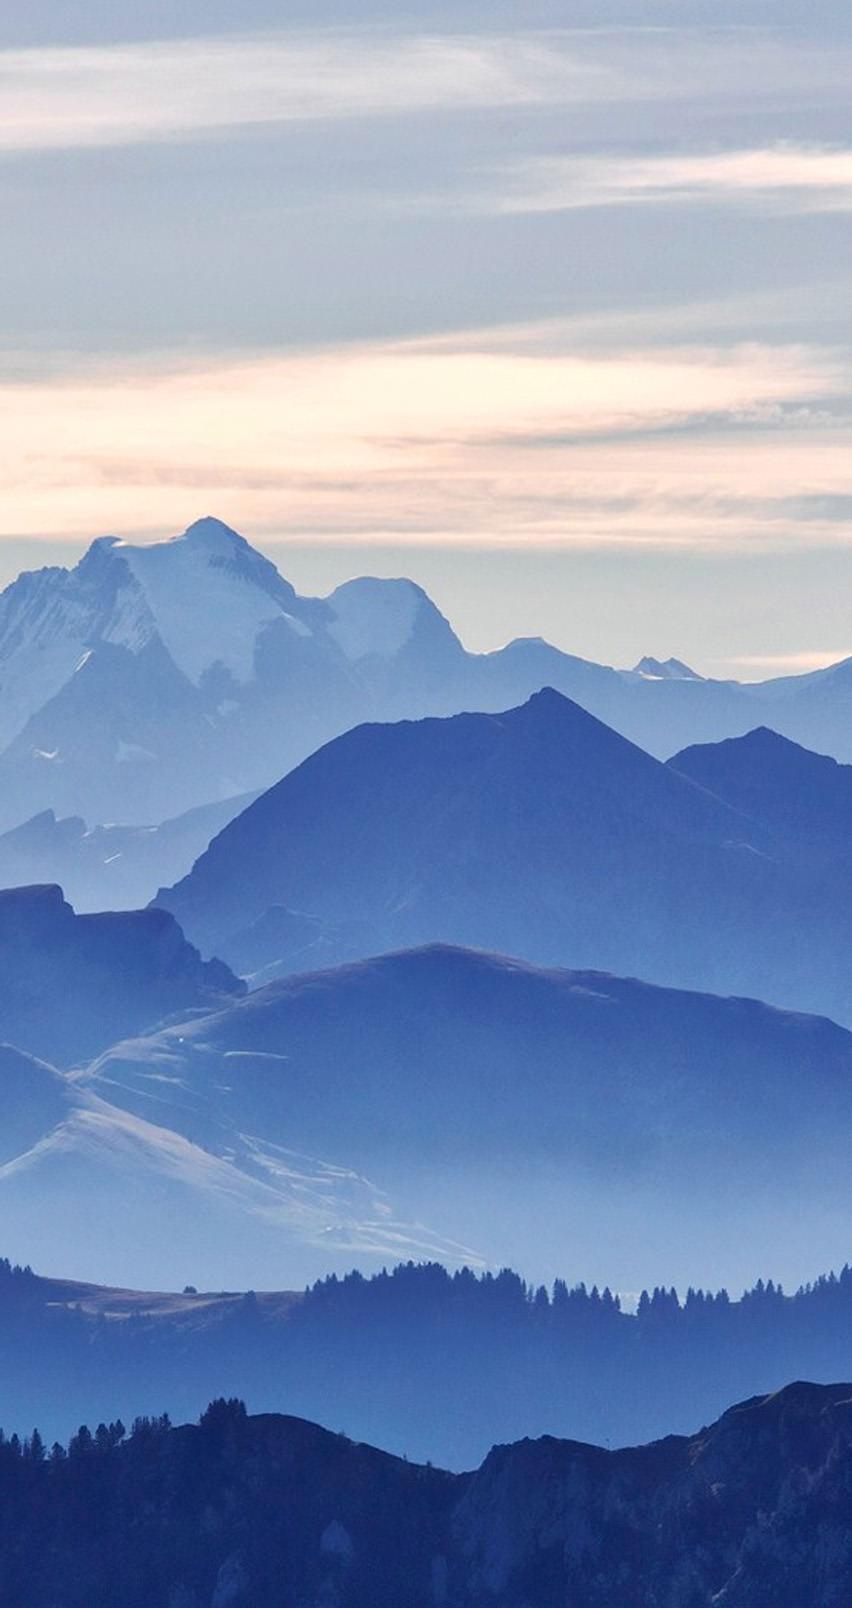 Iphone Natuur Achtergrond High Resolution Mountain